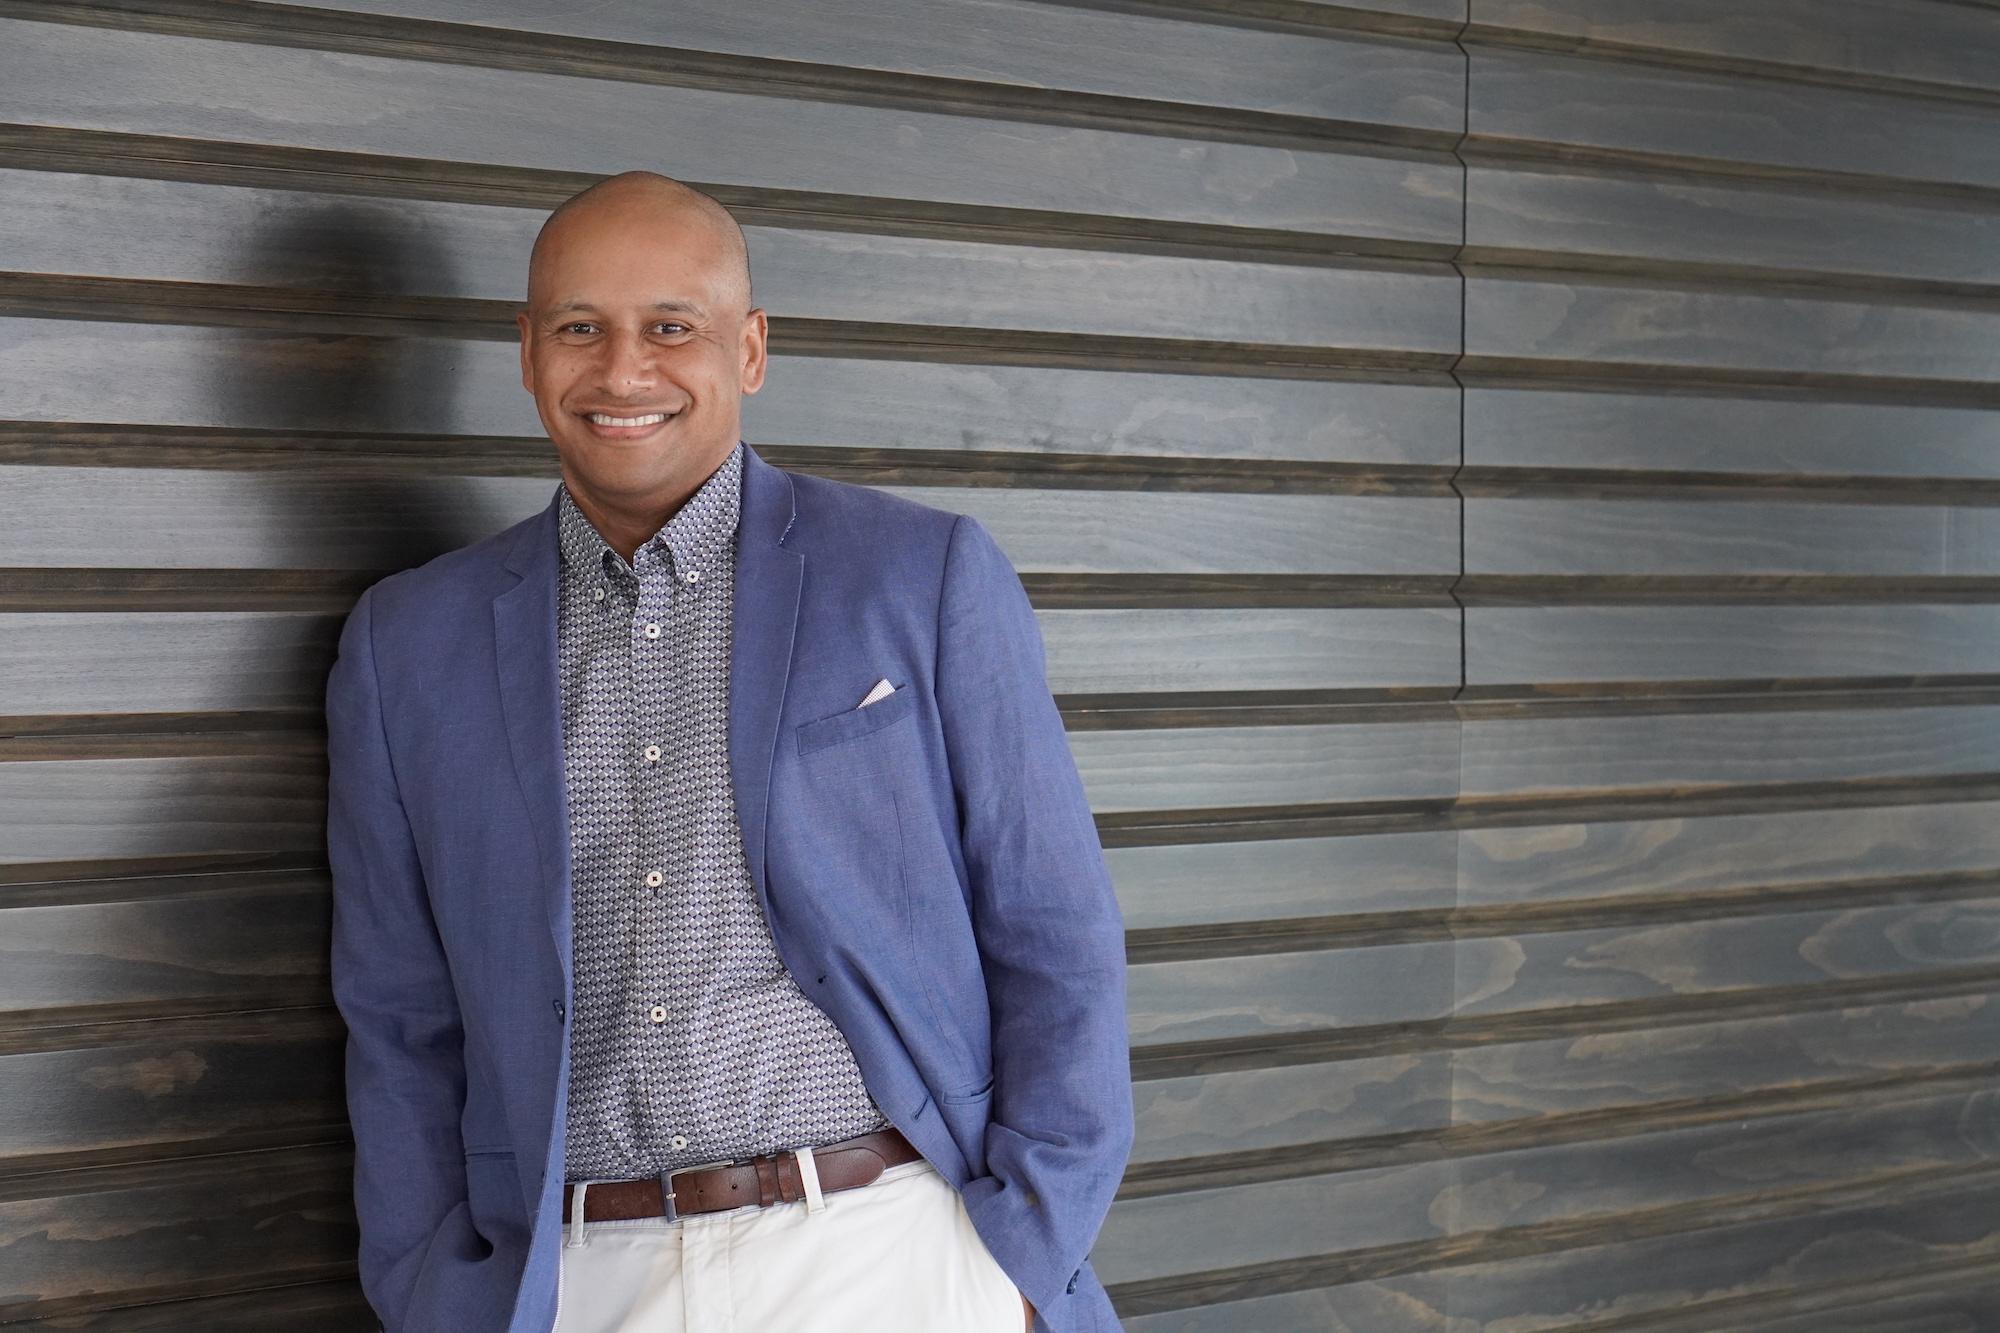 BlinkPay Chief Executive Officer Daniel Karehana